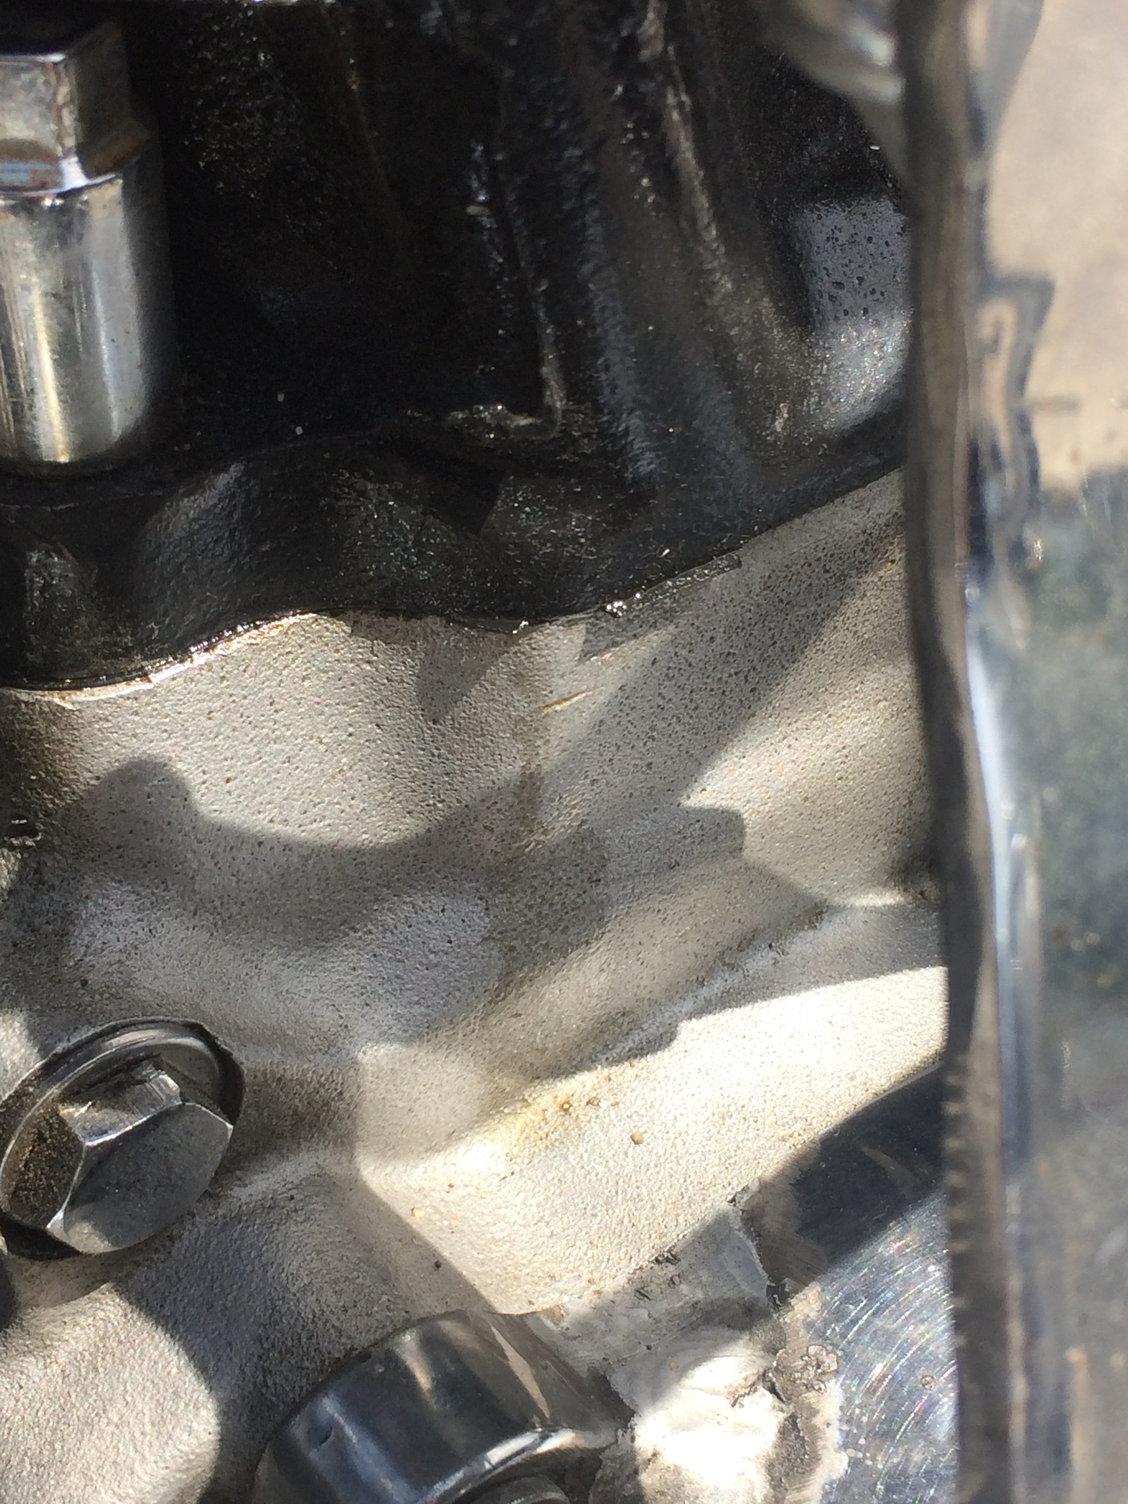 How bad is this base gasket leak? - Harley Davidson Forums